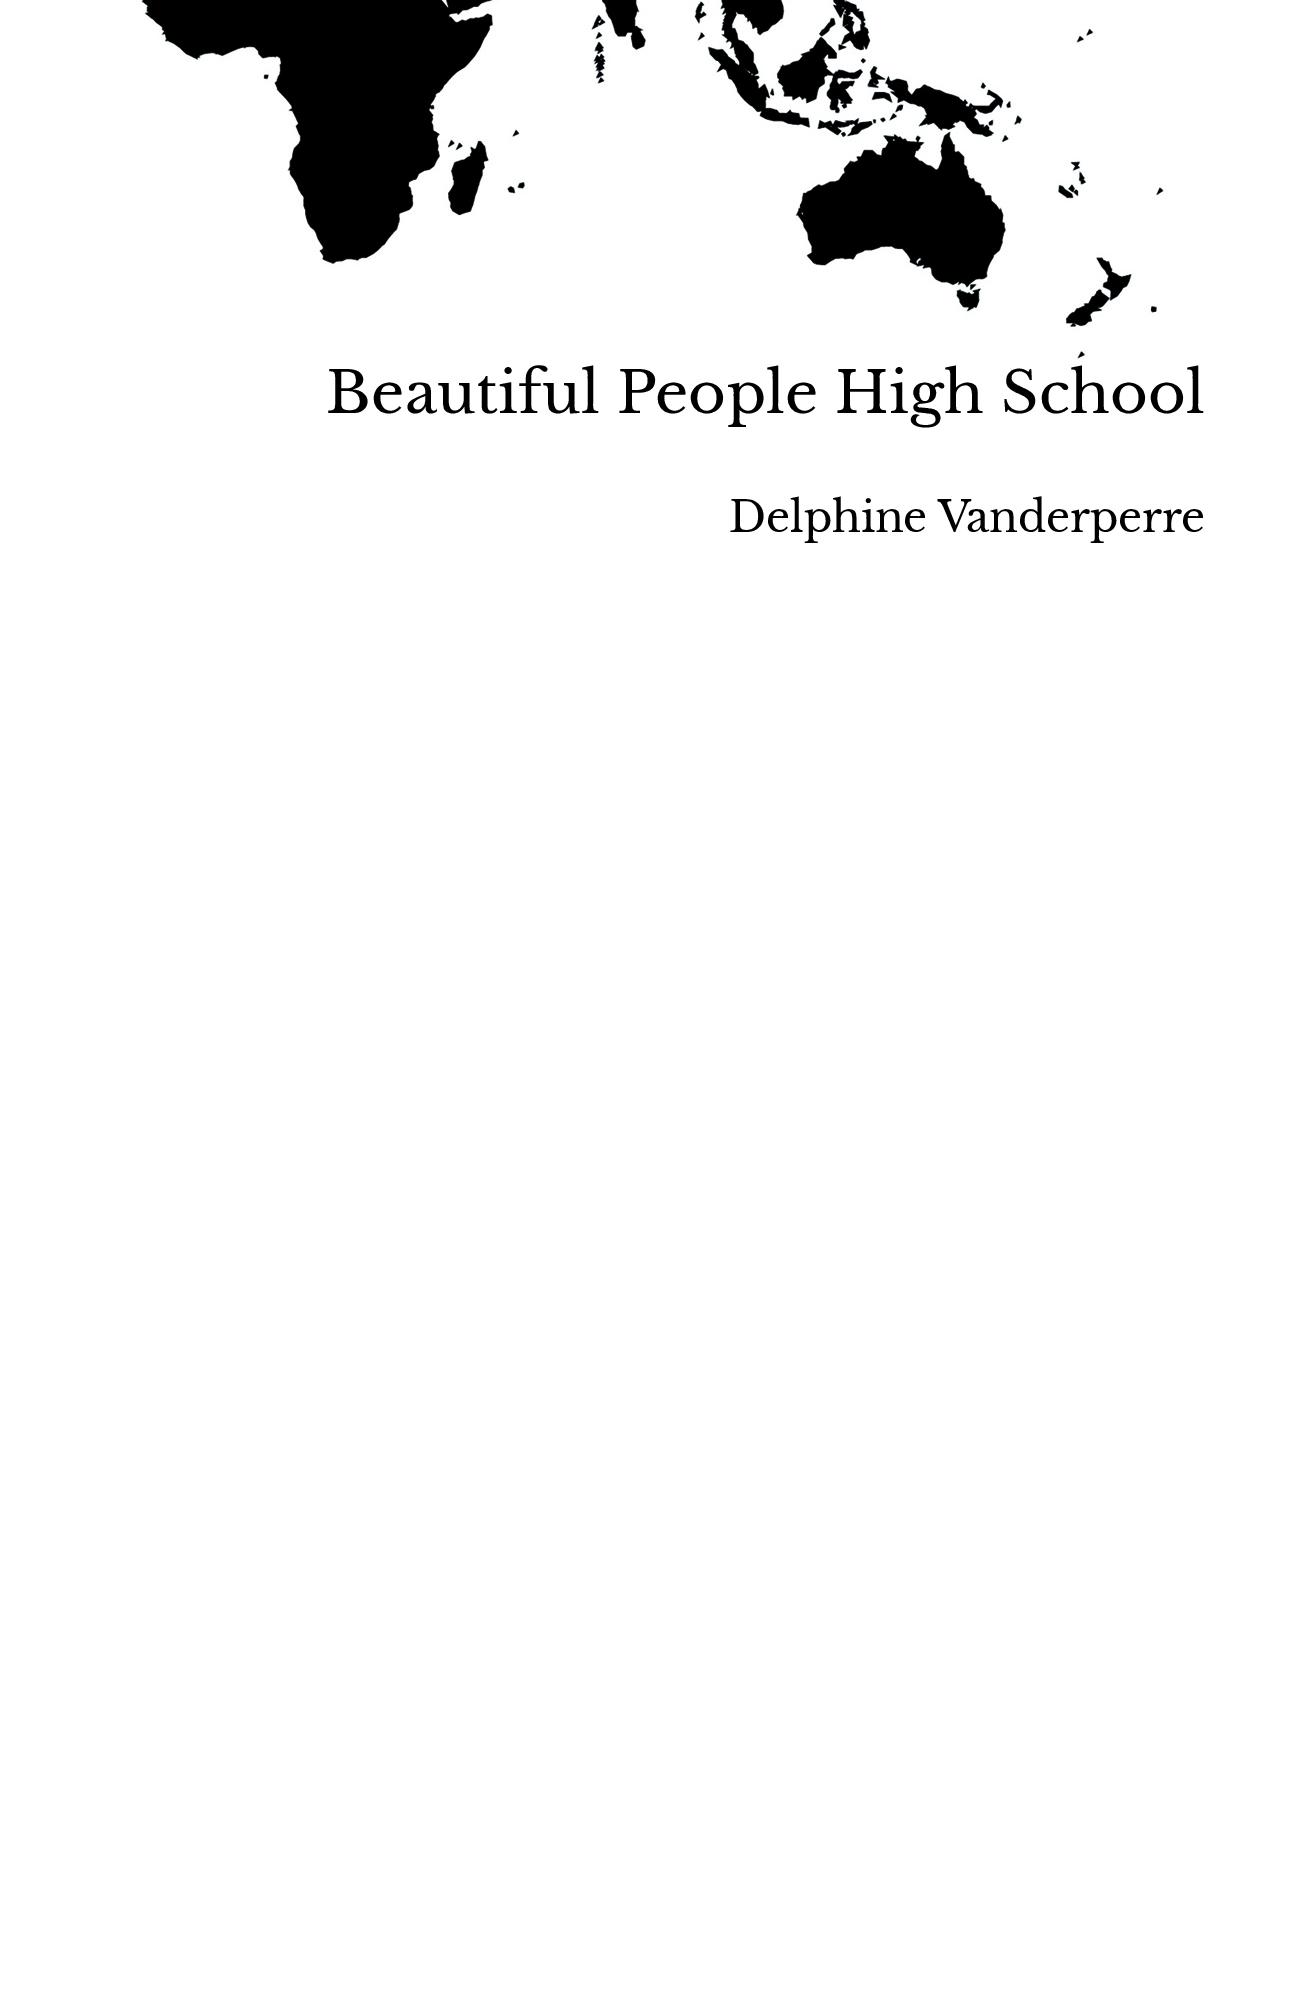 Beautiful People High School